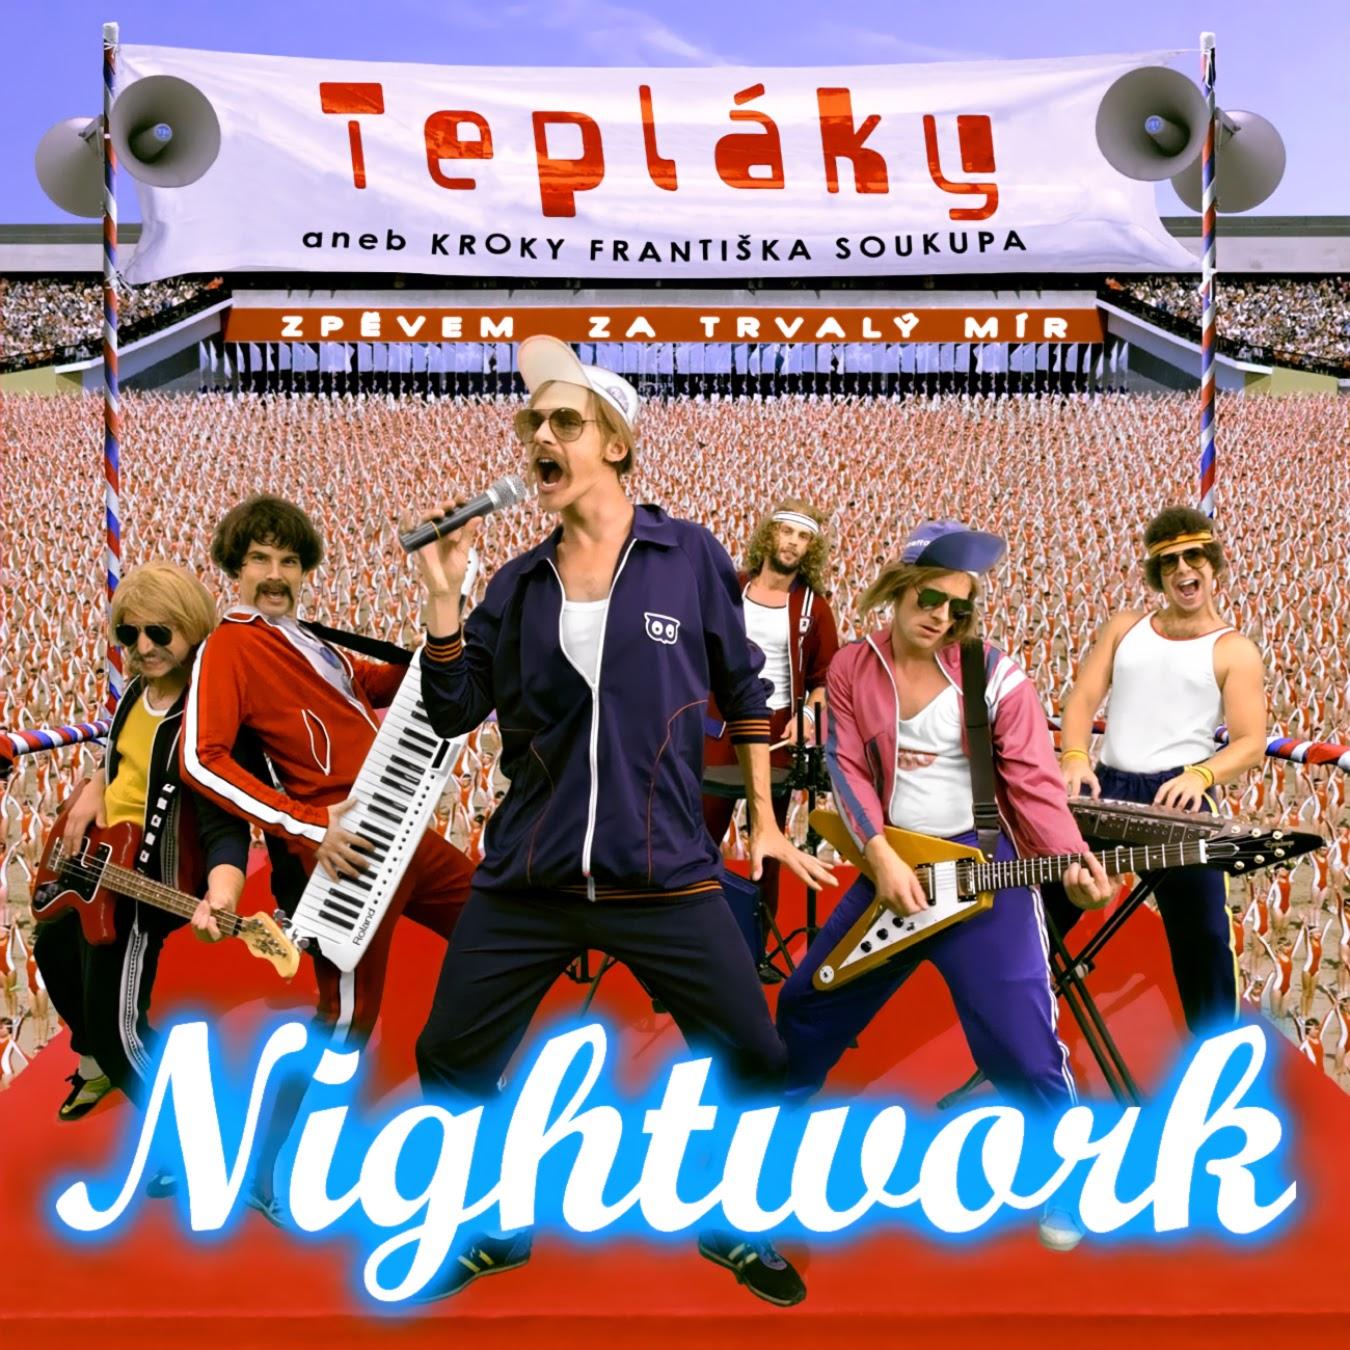 Album Artist: Nightwork / Album Title: Tepláky aneb Kroky Františka Soukupa